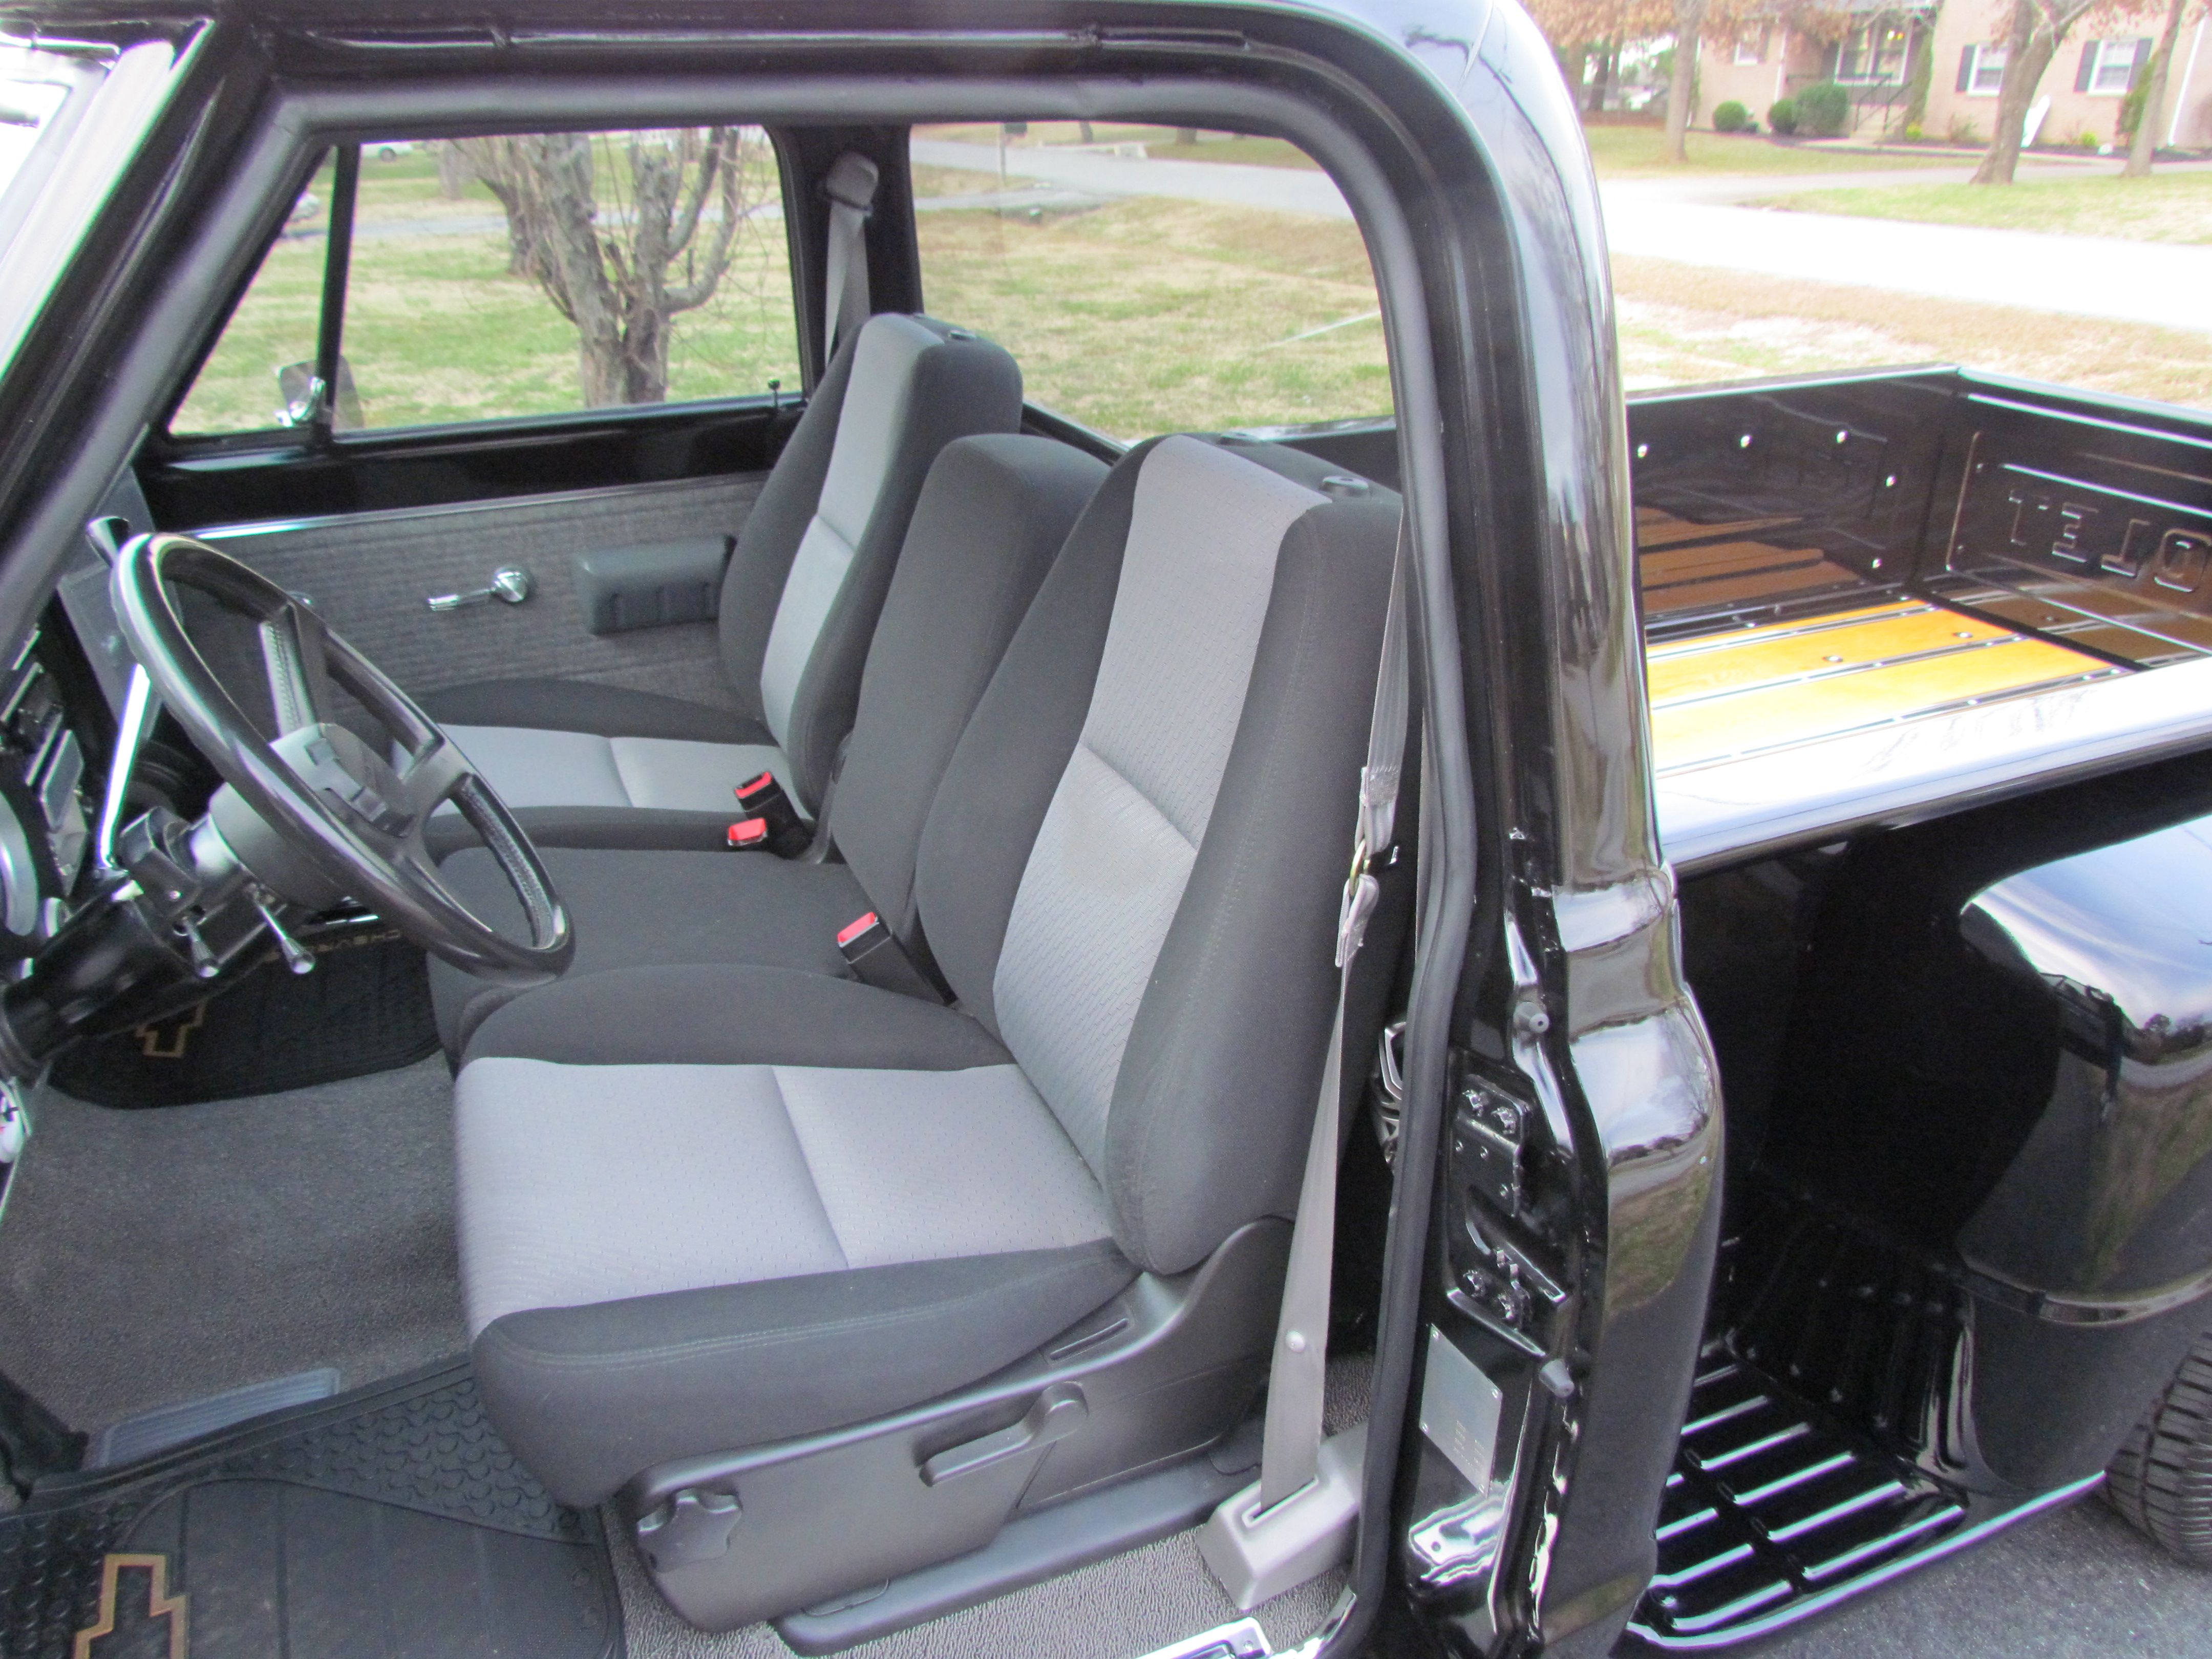 1971 Chevy Custom Truck Seats 1971 Chevrolet C10